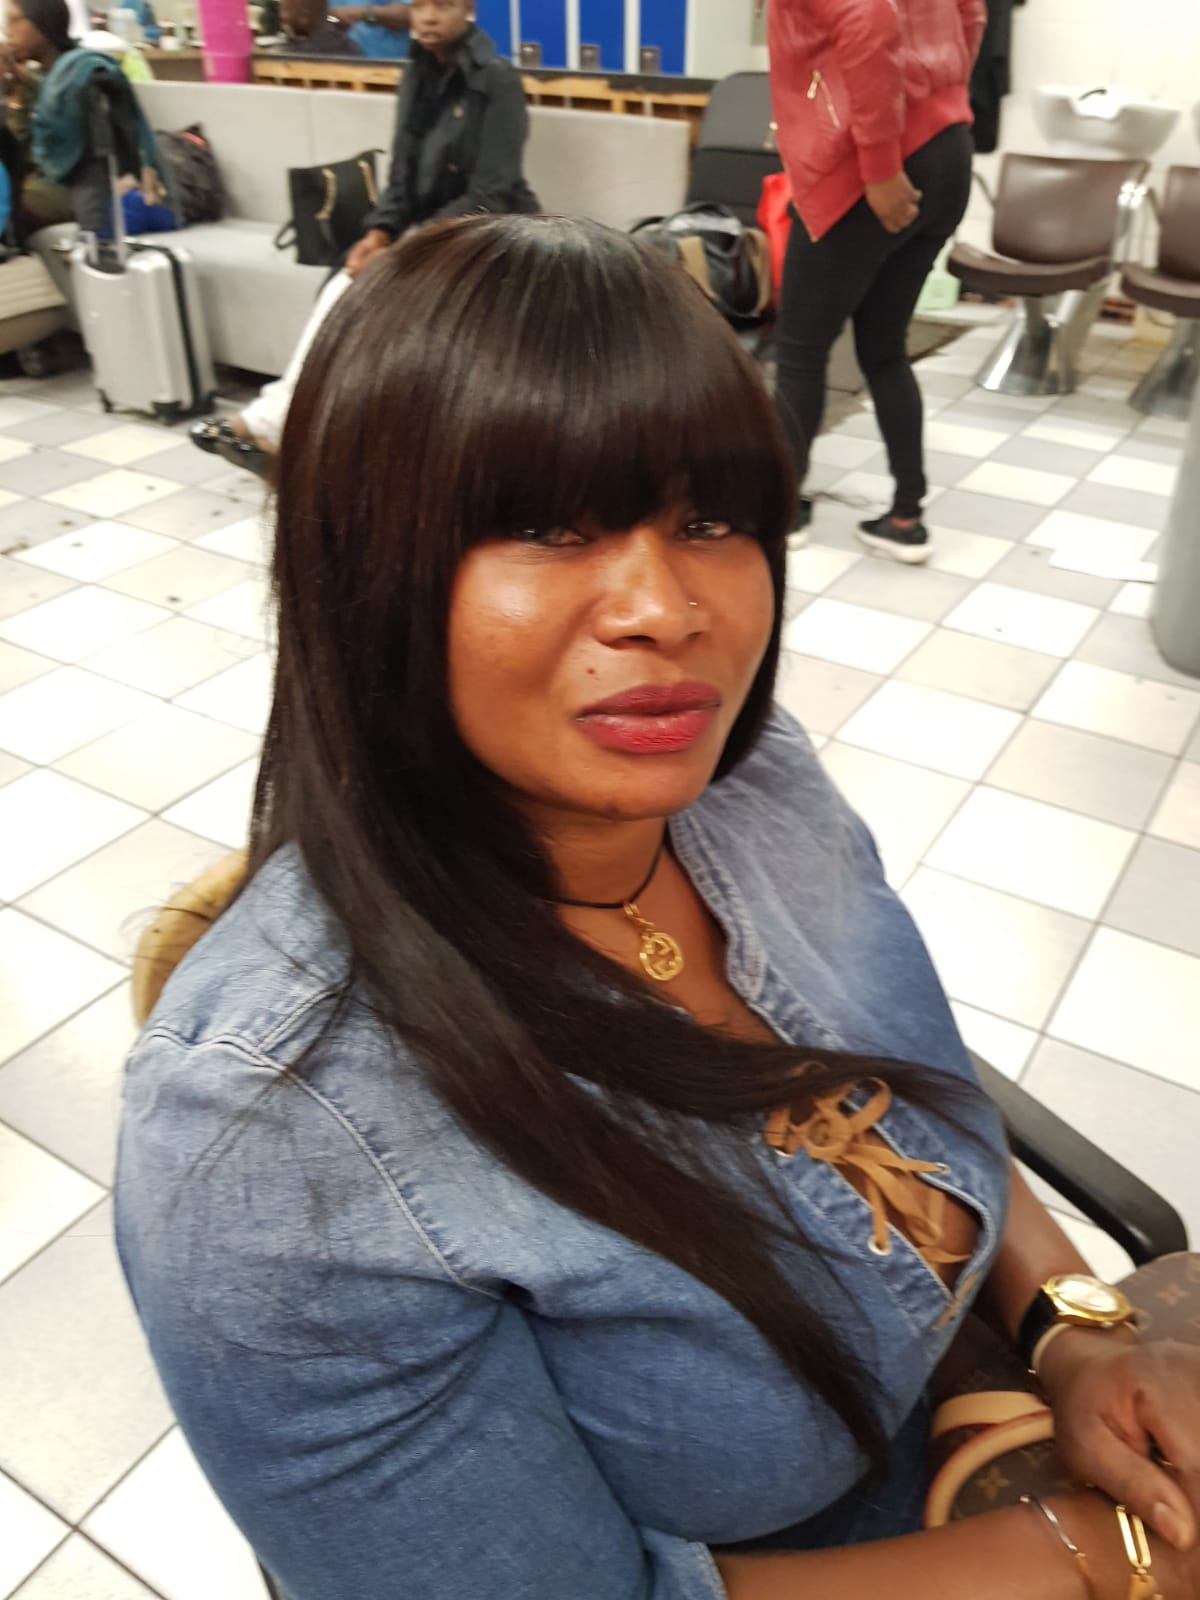 salon de coiffure afro tresse tresses box braids crochet braids vanilles tissages paris 75 77 78 91 92 93 94 95 LFUUODMV